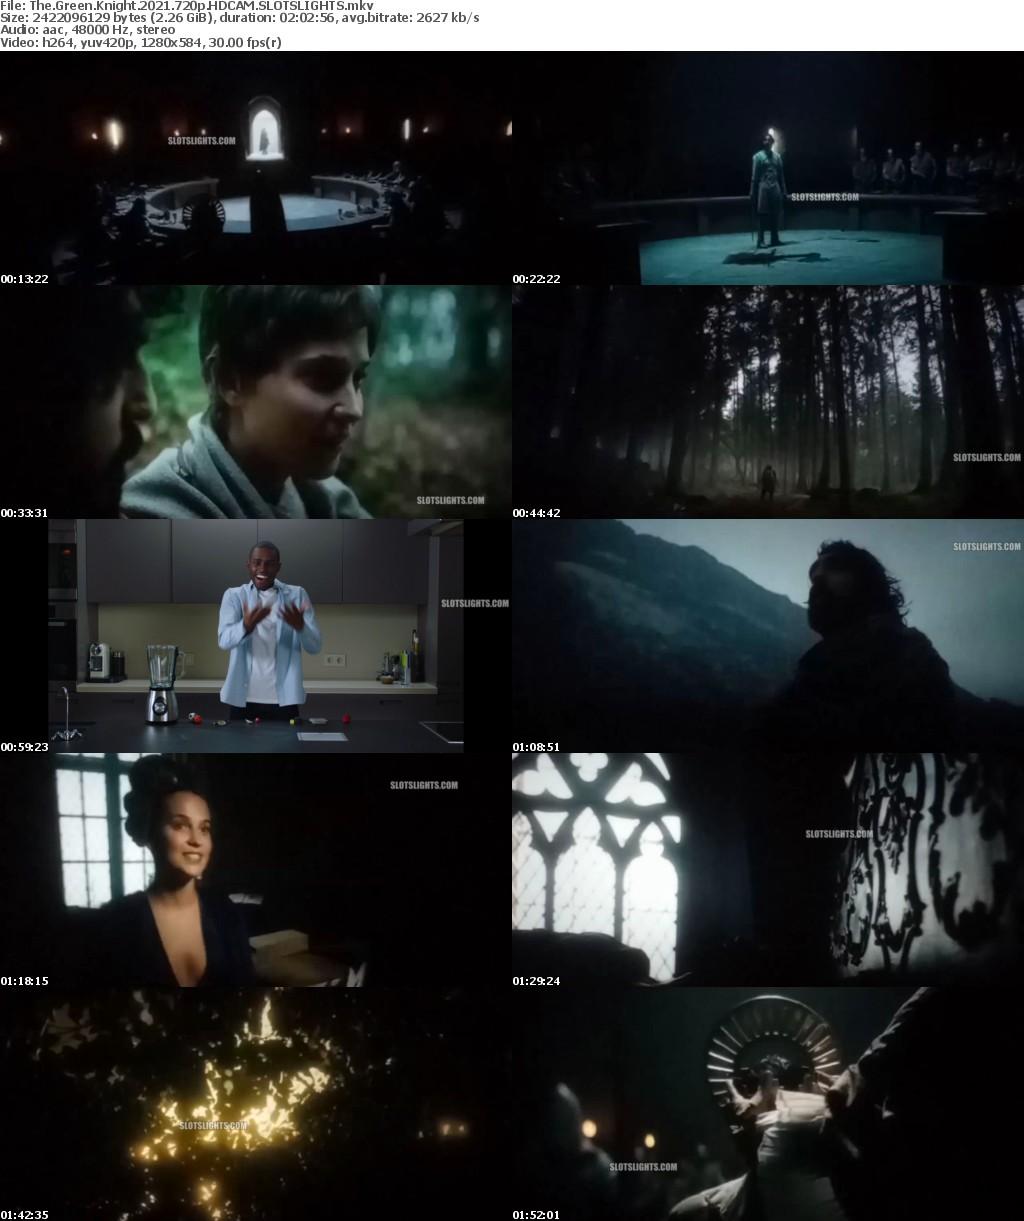 The Green Knight (2021) 720p HDCAM-C1NEM4